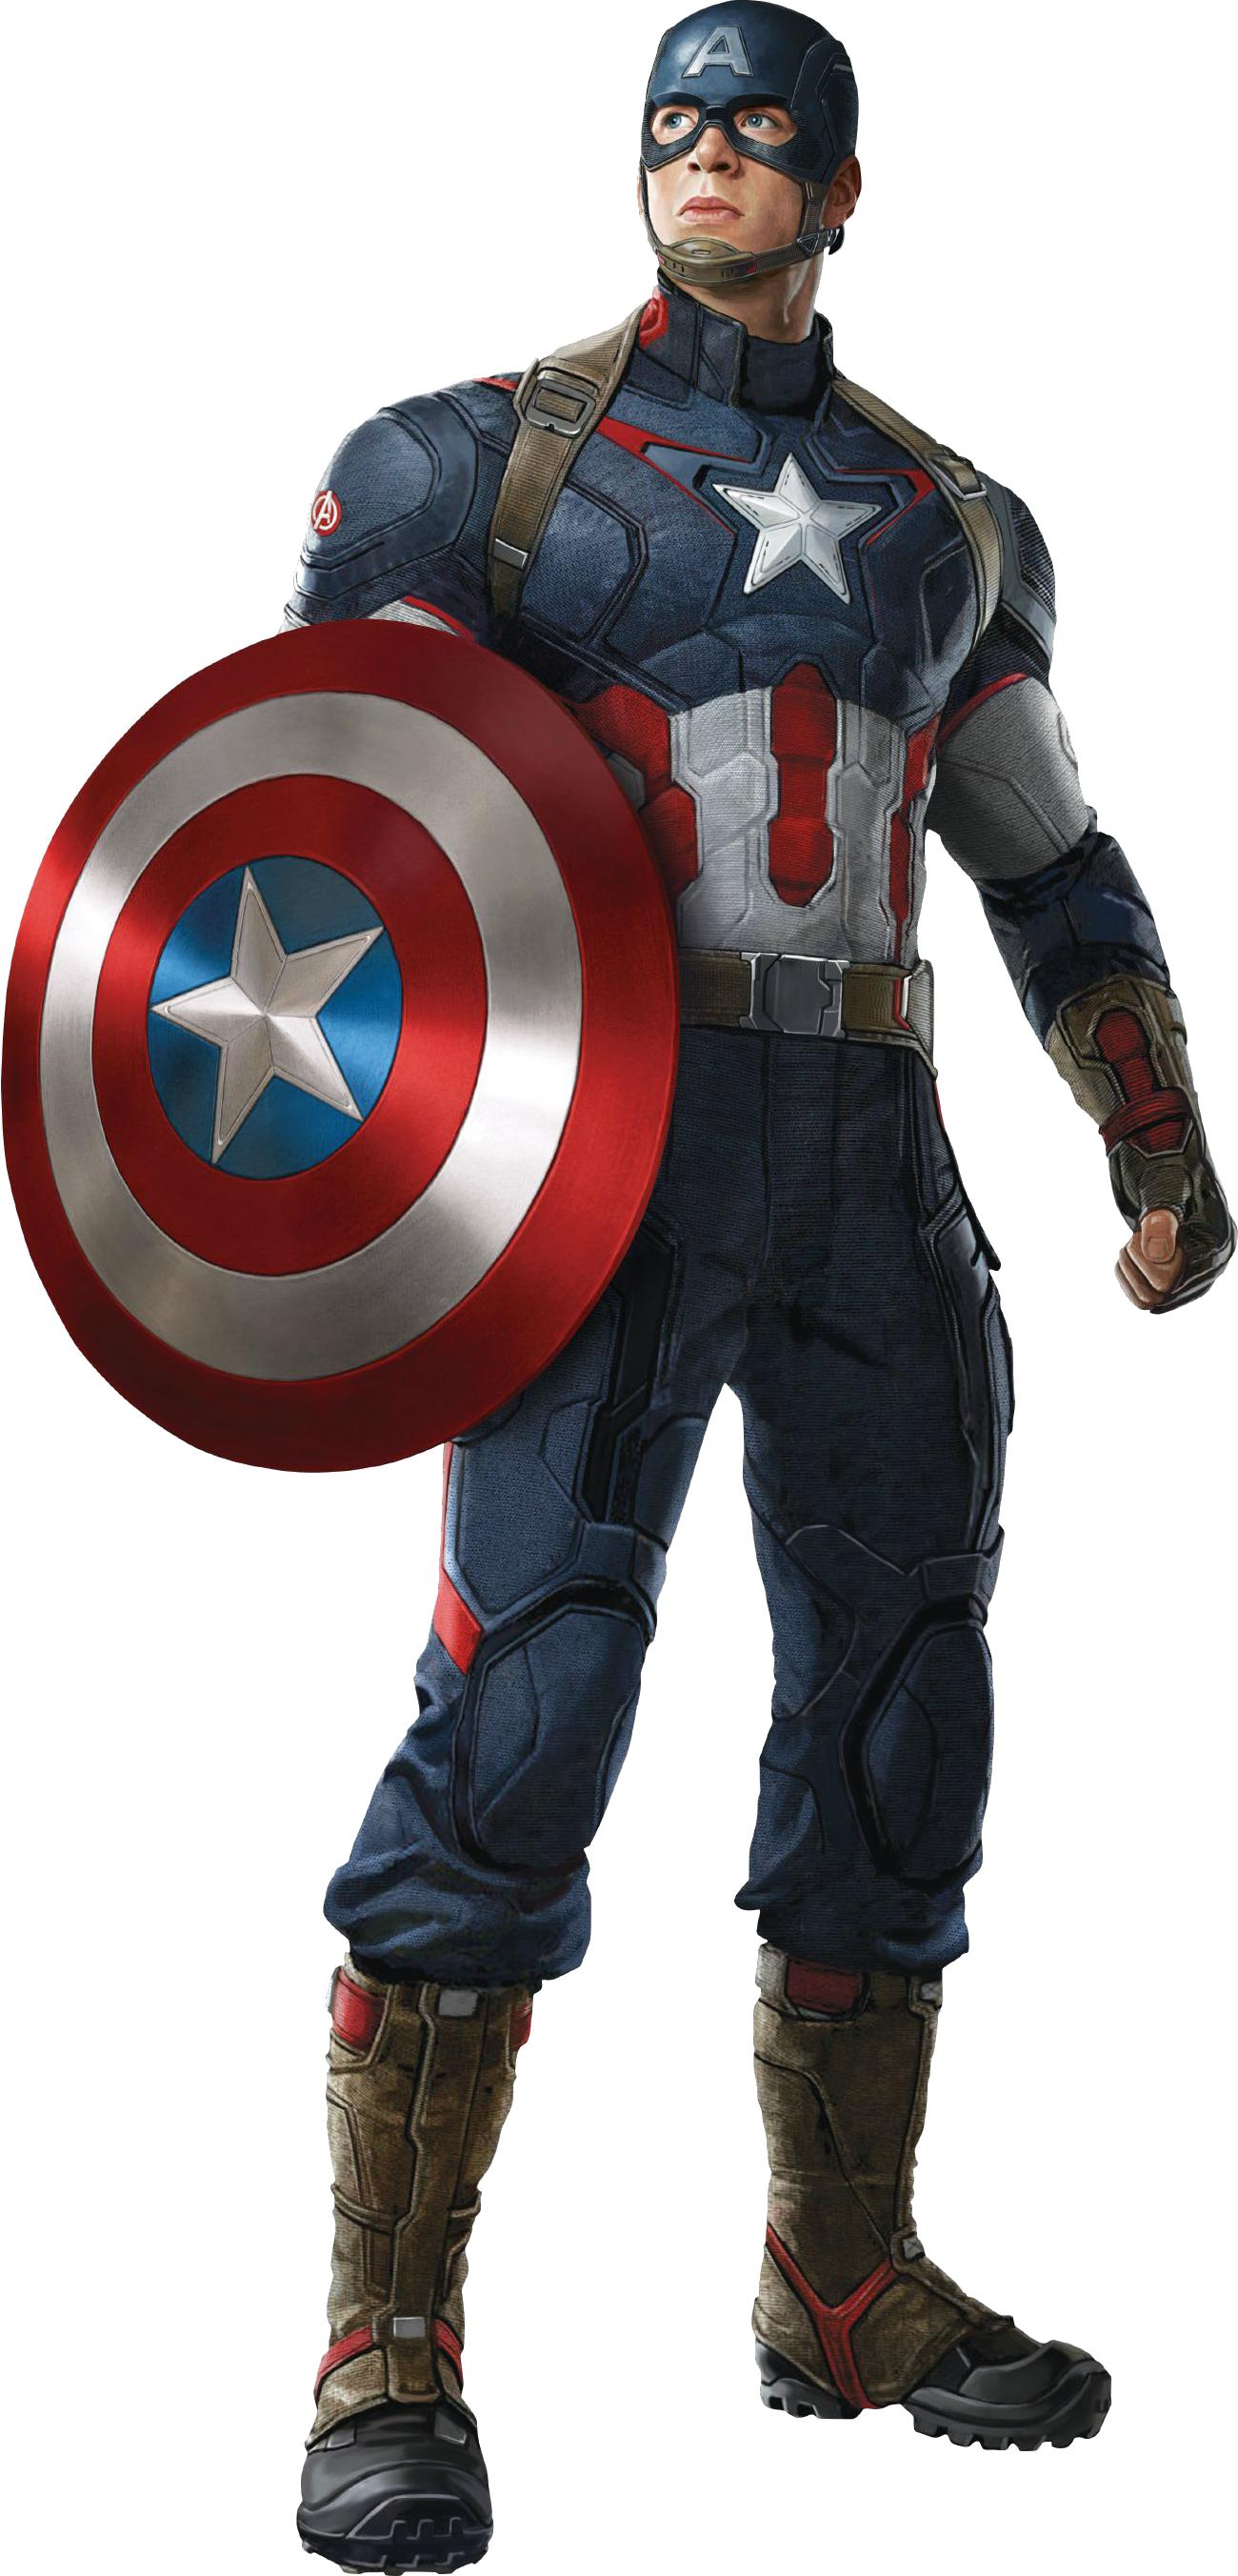 PNG Images Captain America, Avengers Endgame Captain ...